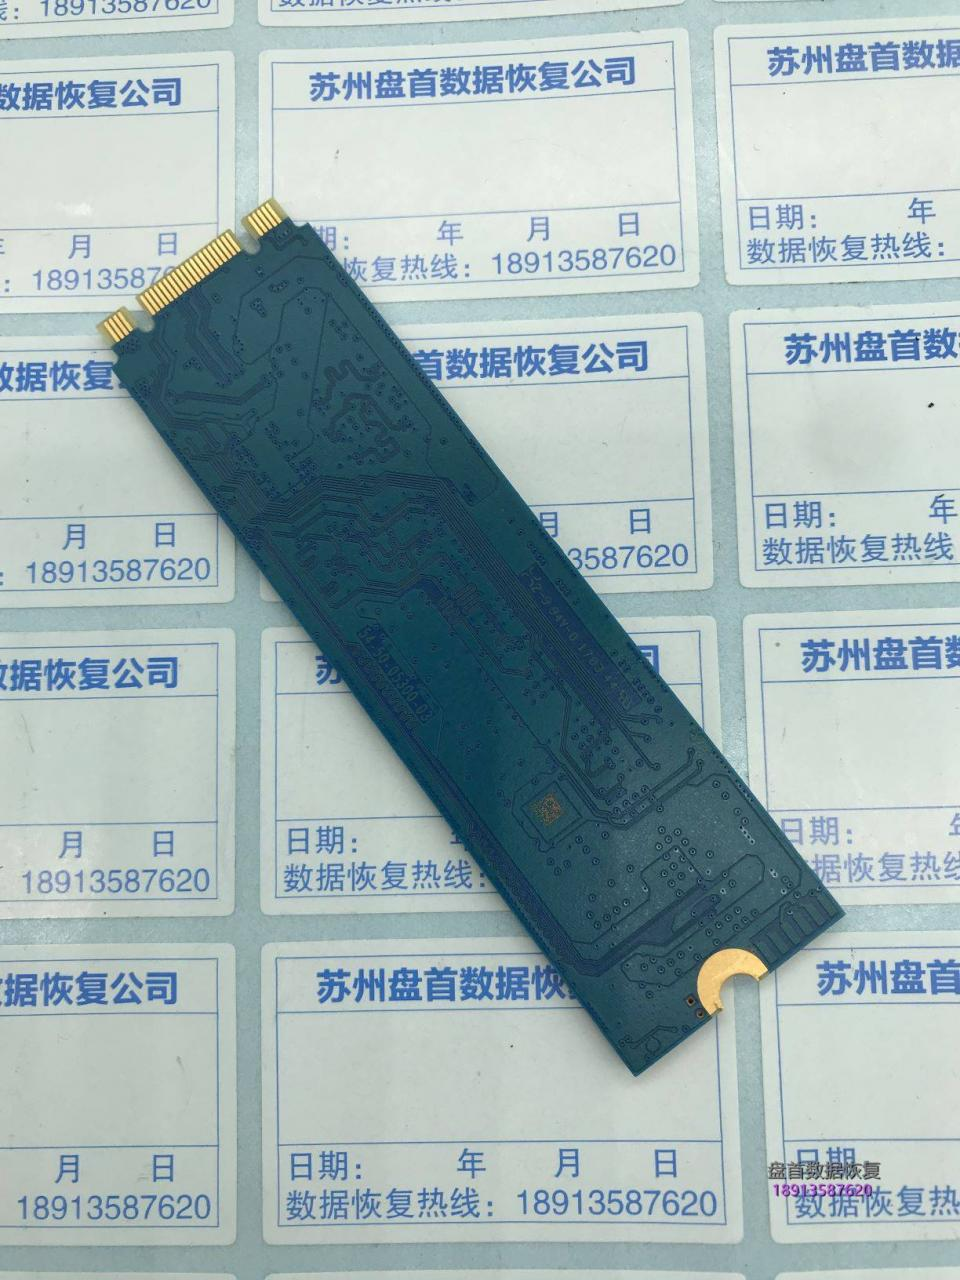 SanDisk闪迪X400固态硬盘无法识别读不到盘主控Marvell 88SS1074数据恢复成功